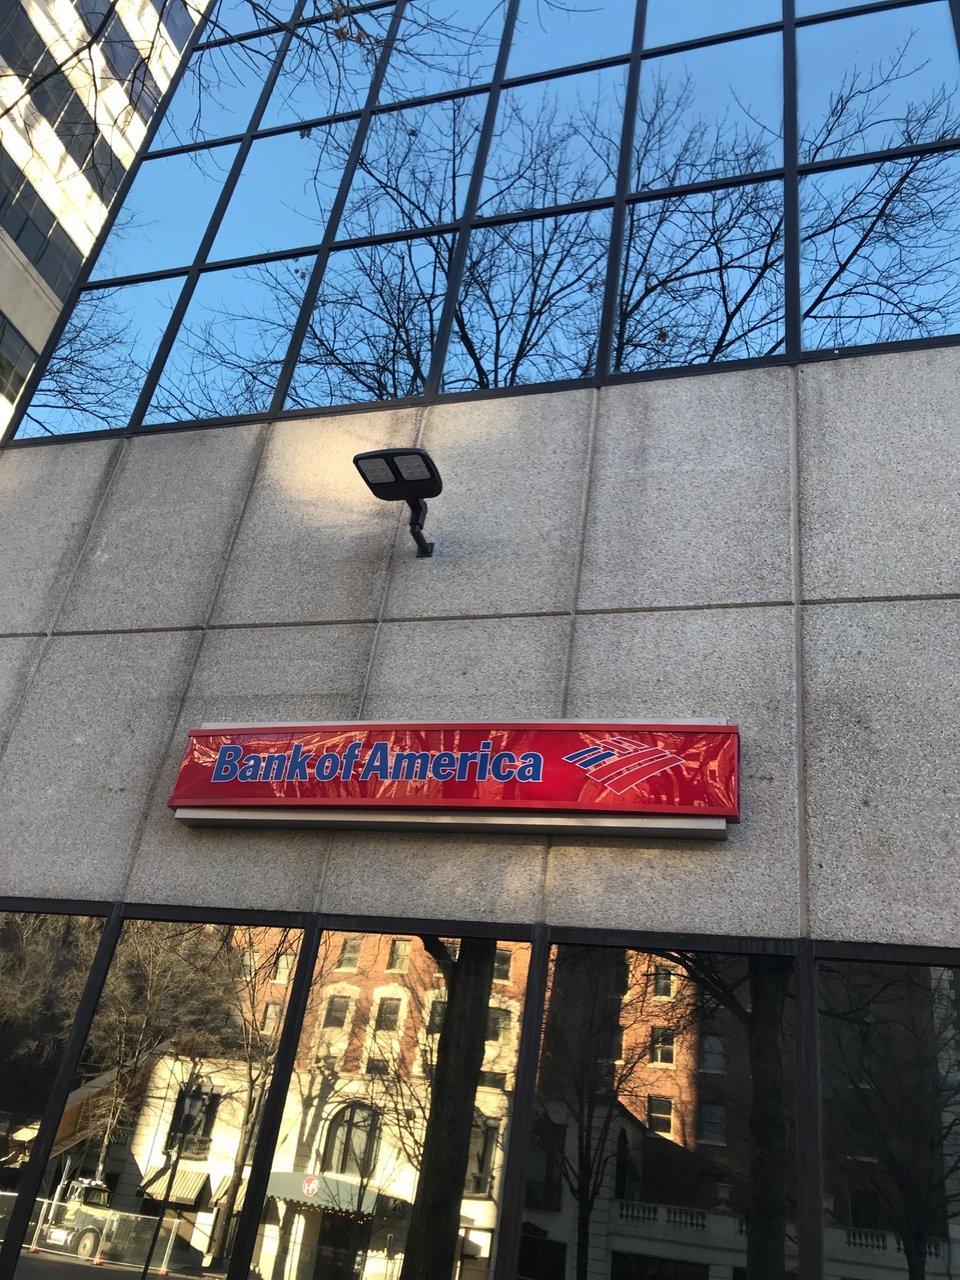 Bank of America Chattanooga